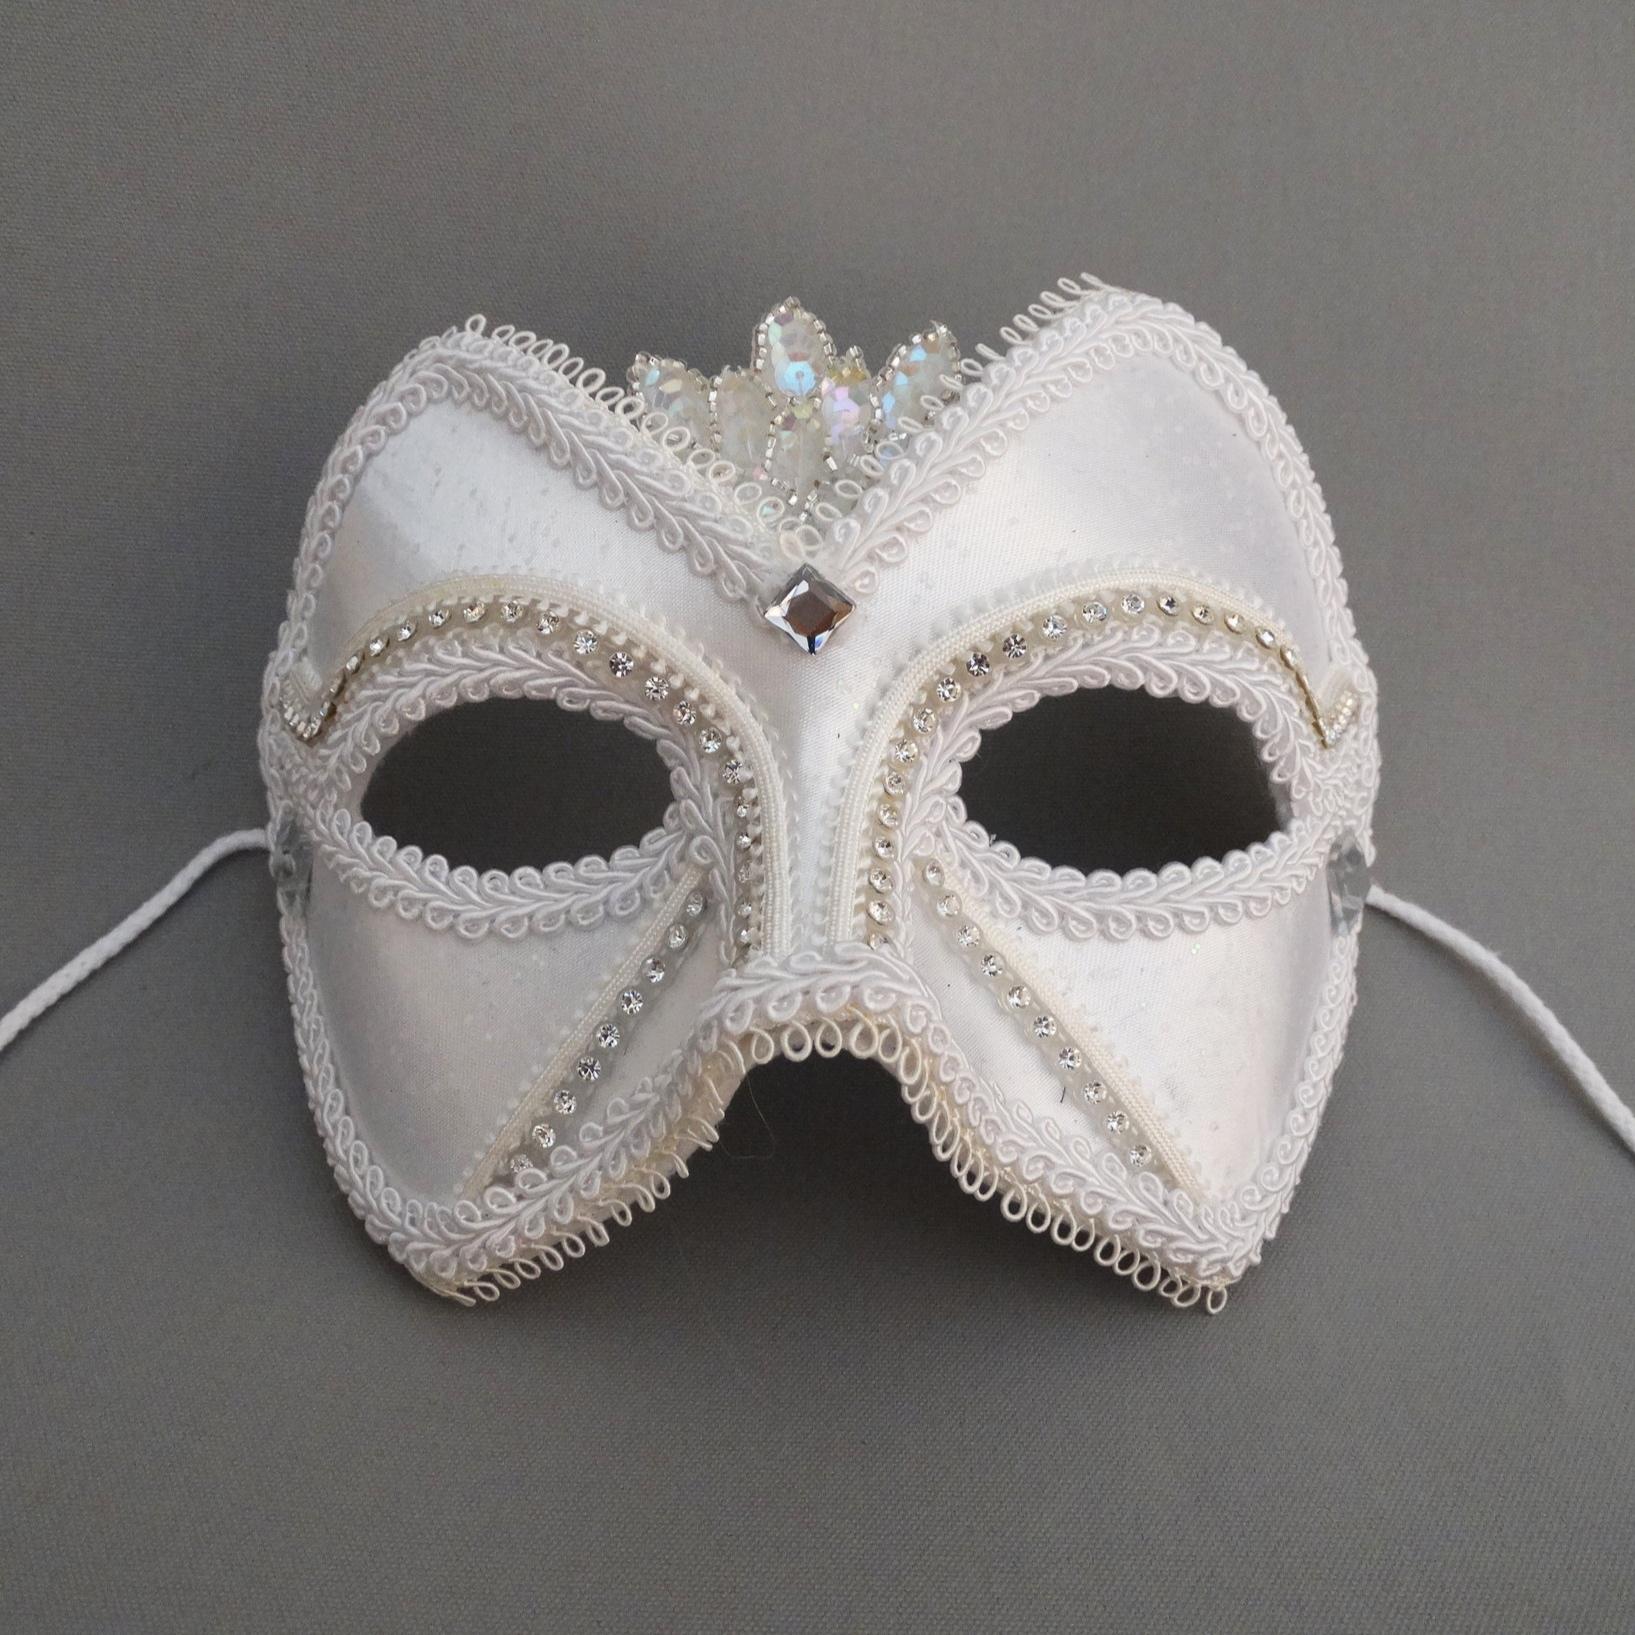 Cinderella Companion Masquerade Mask Thumb